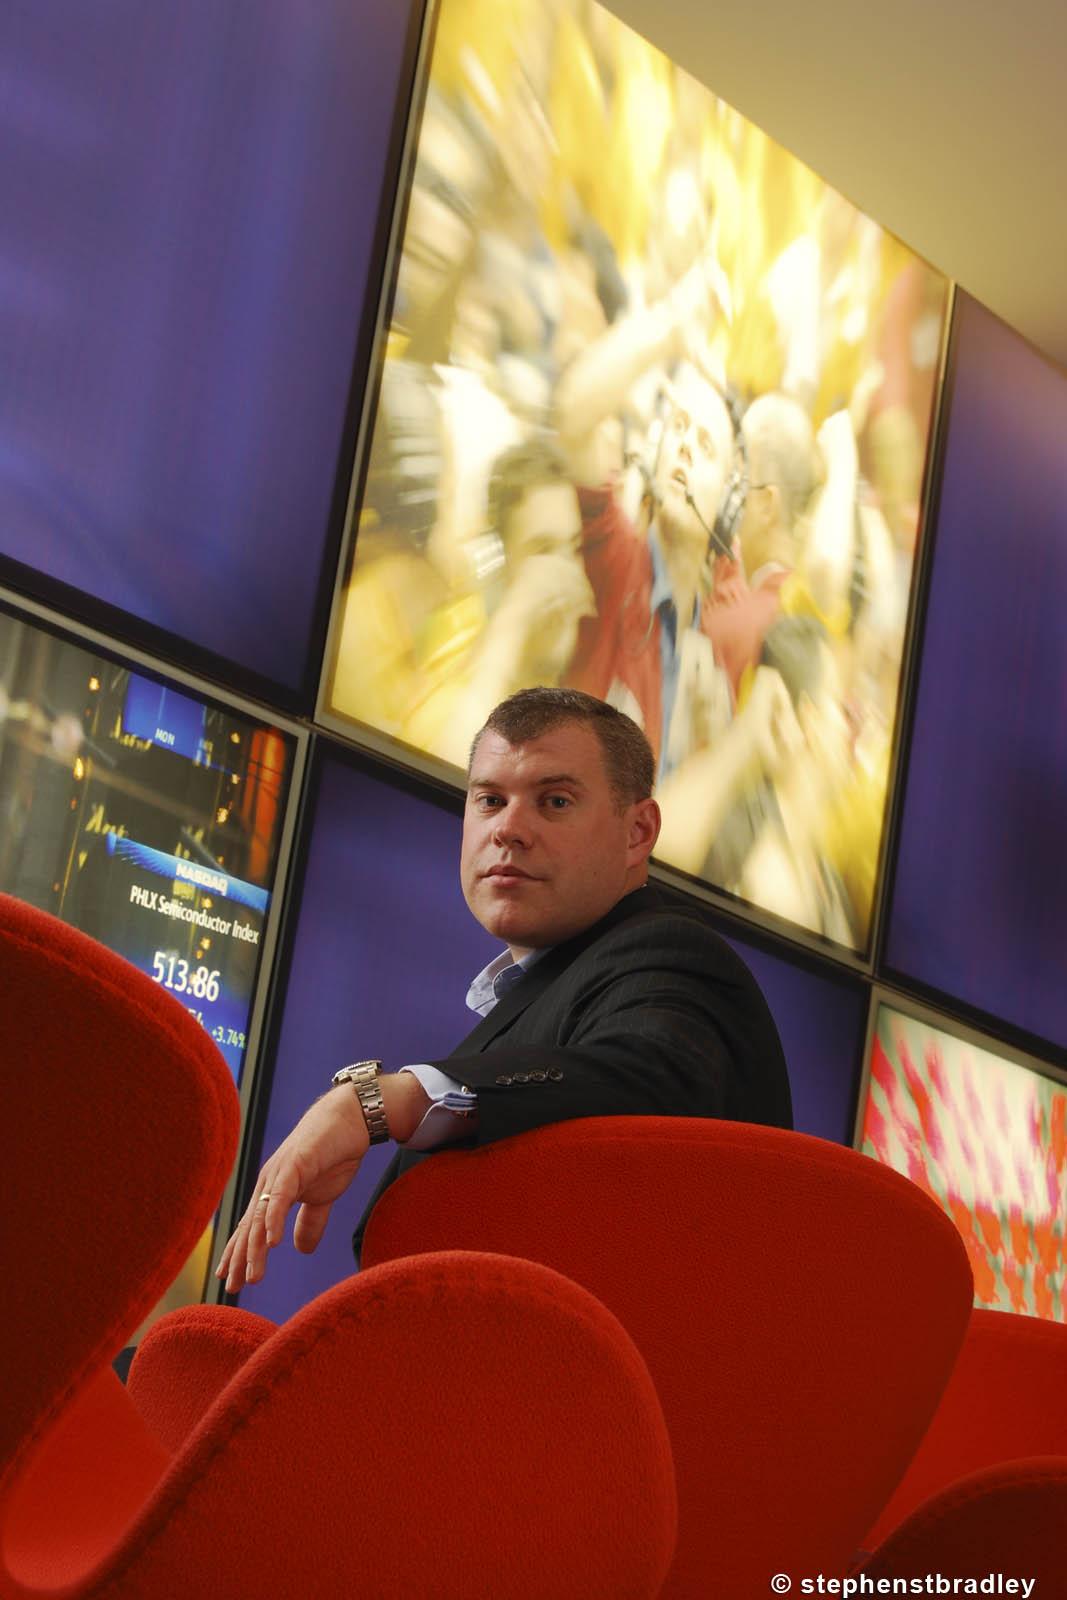 Editorial photographer Dublin portfolio upright photo 0127 - IT executive Simon Riggs photographed at Reuters, London